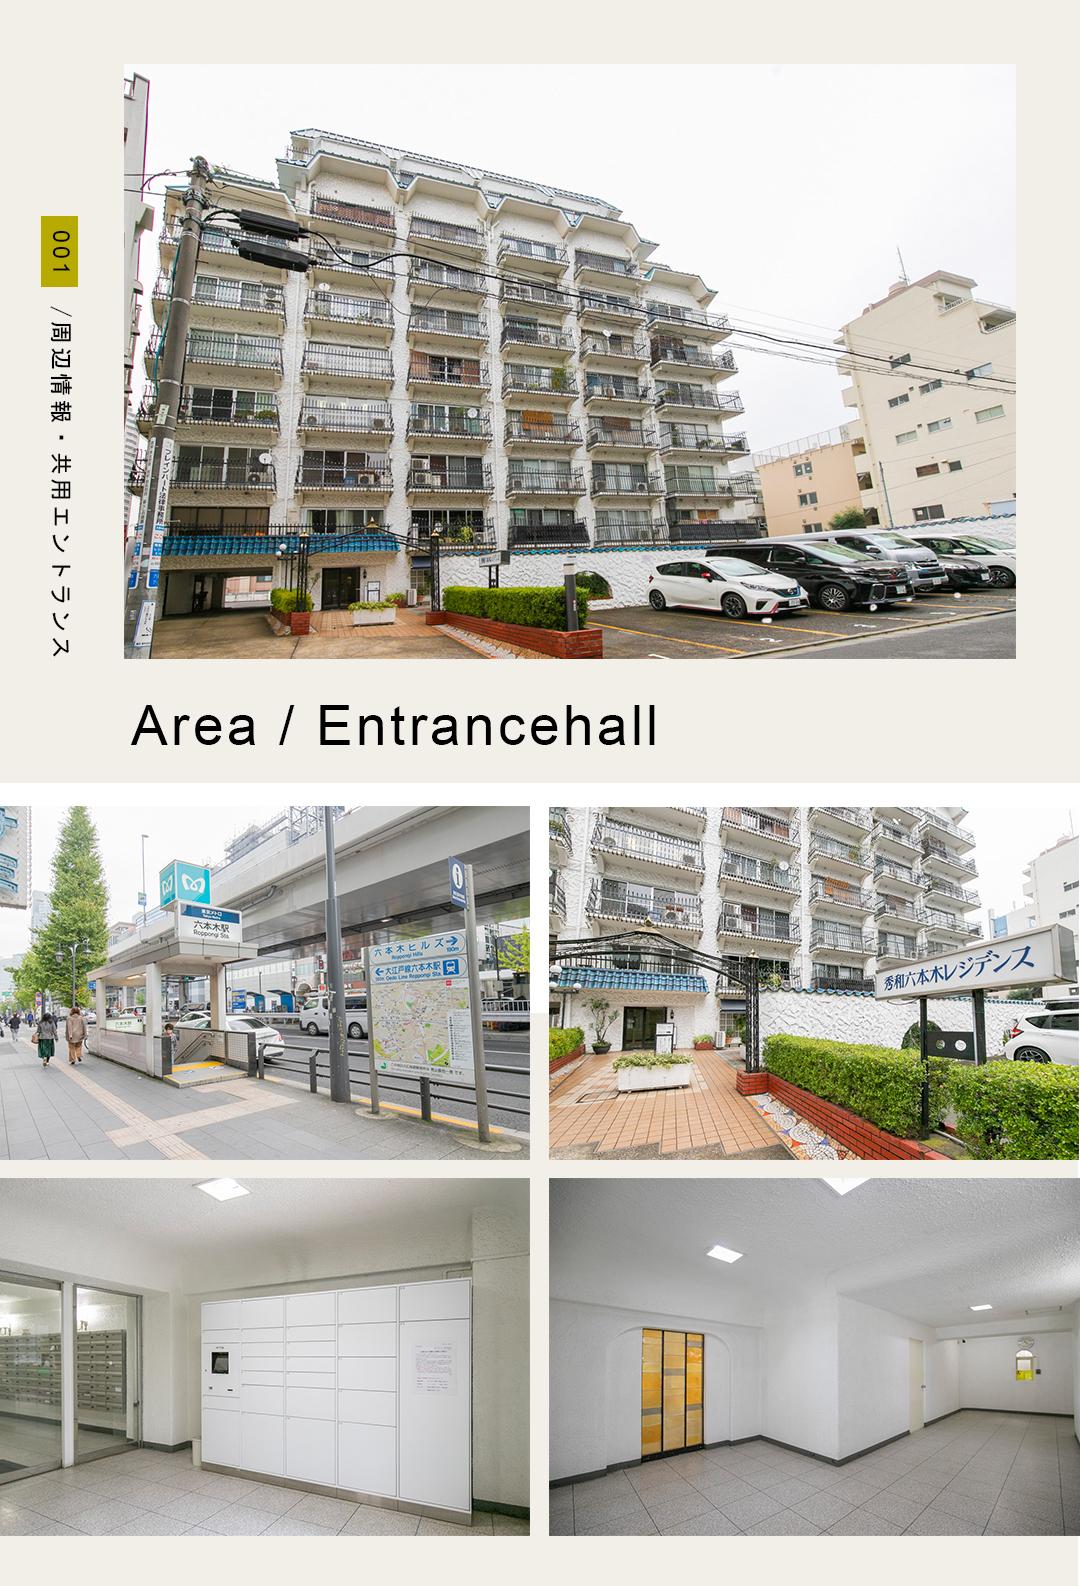 001Area,entrancehole,周辺情報,共用エントランス